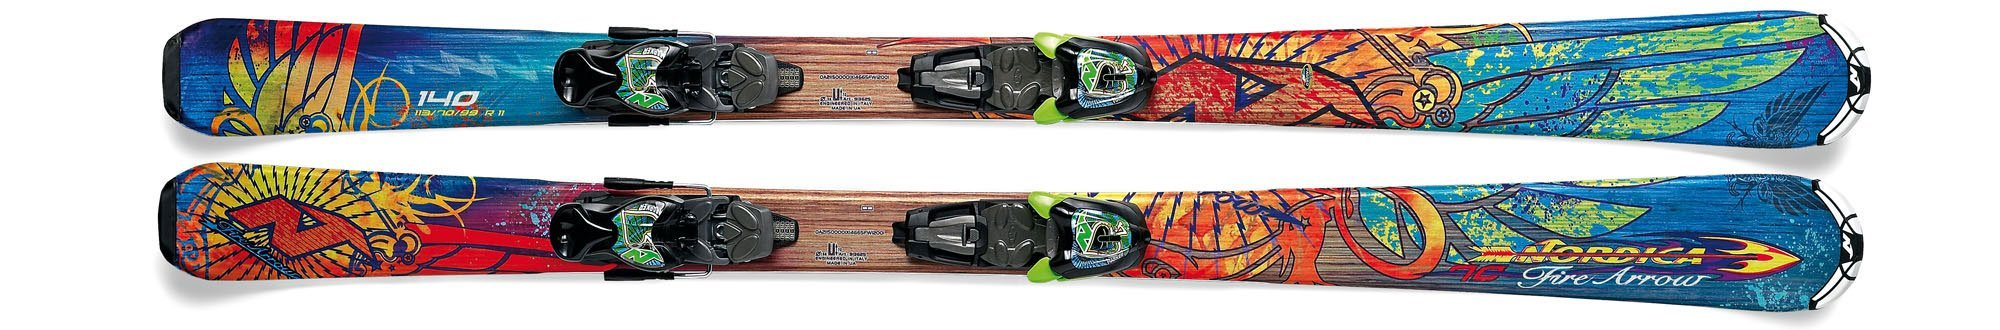 Fire Arrow 70 Fastrak